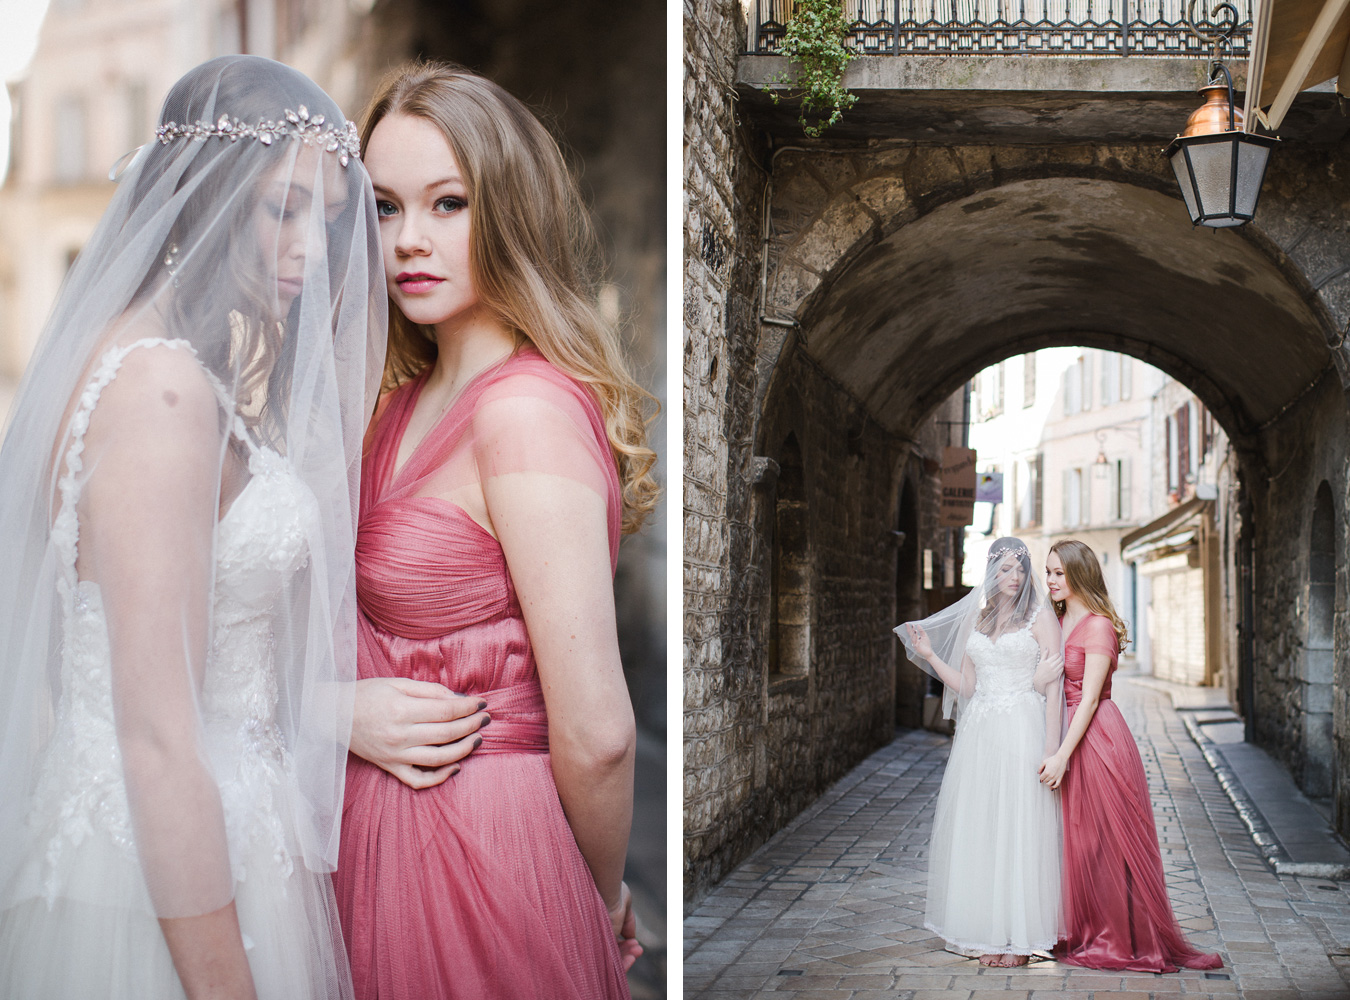 003-fotograf-tone-tvedt-bryllup-i-utlandet.jpg